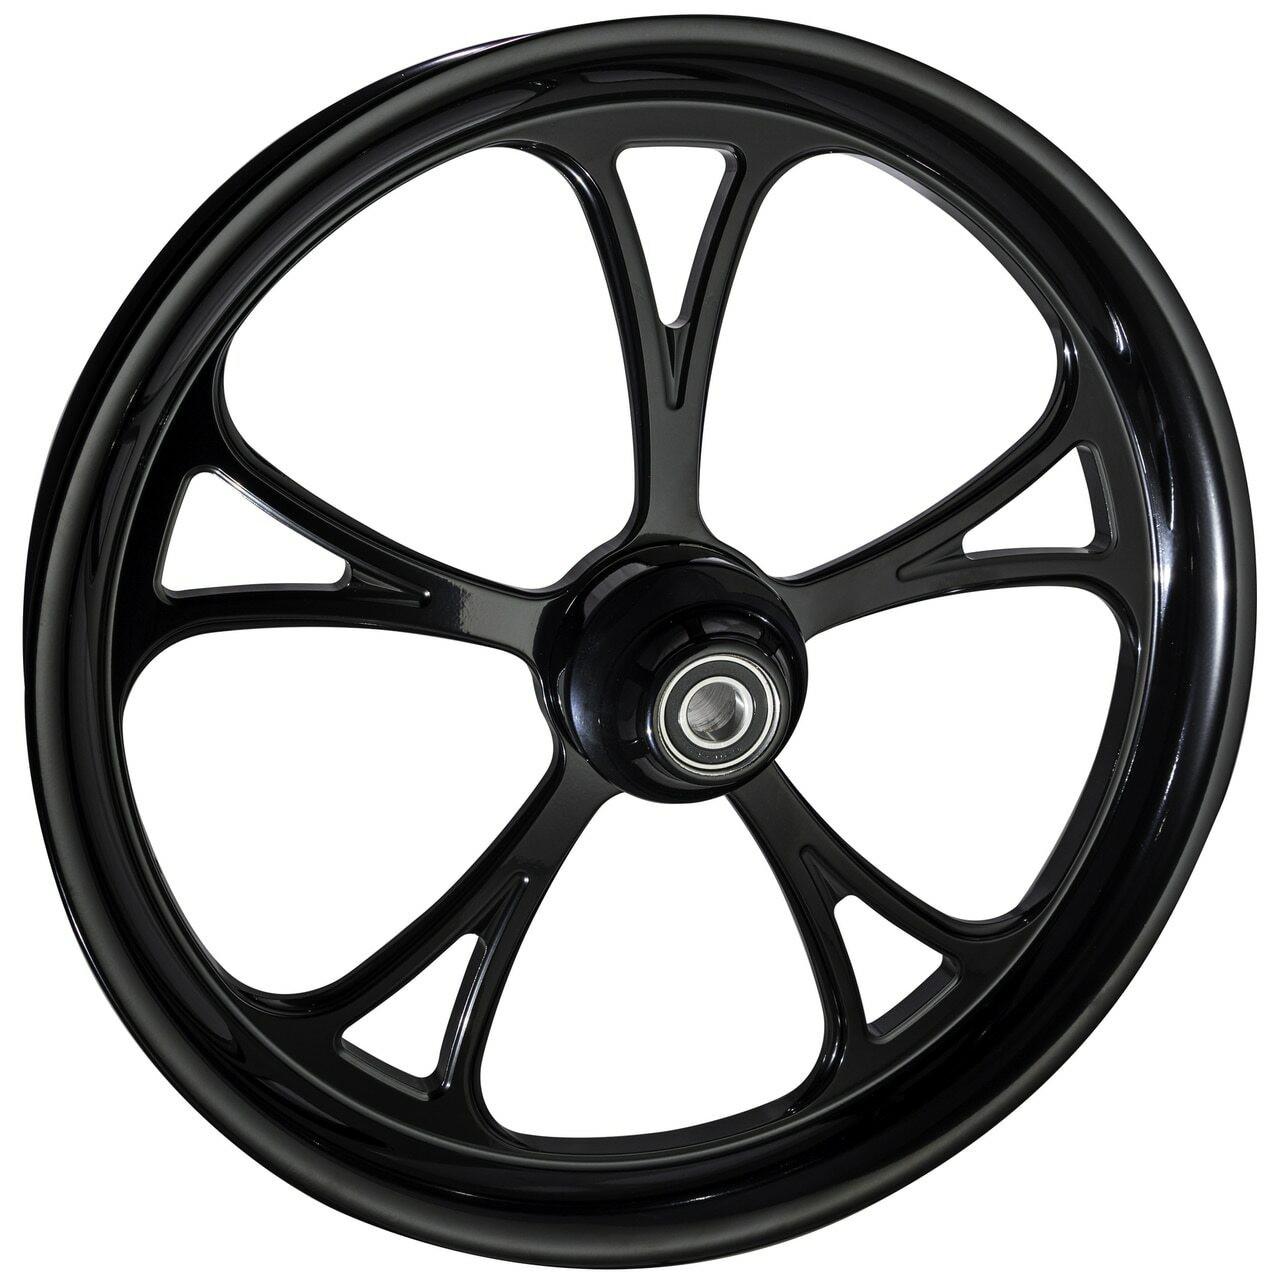 21 inch Black Ultra Wheels by FTD Customs